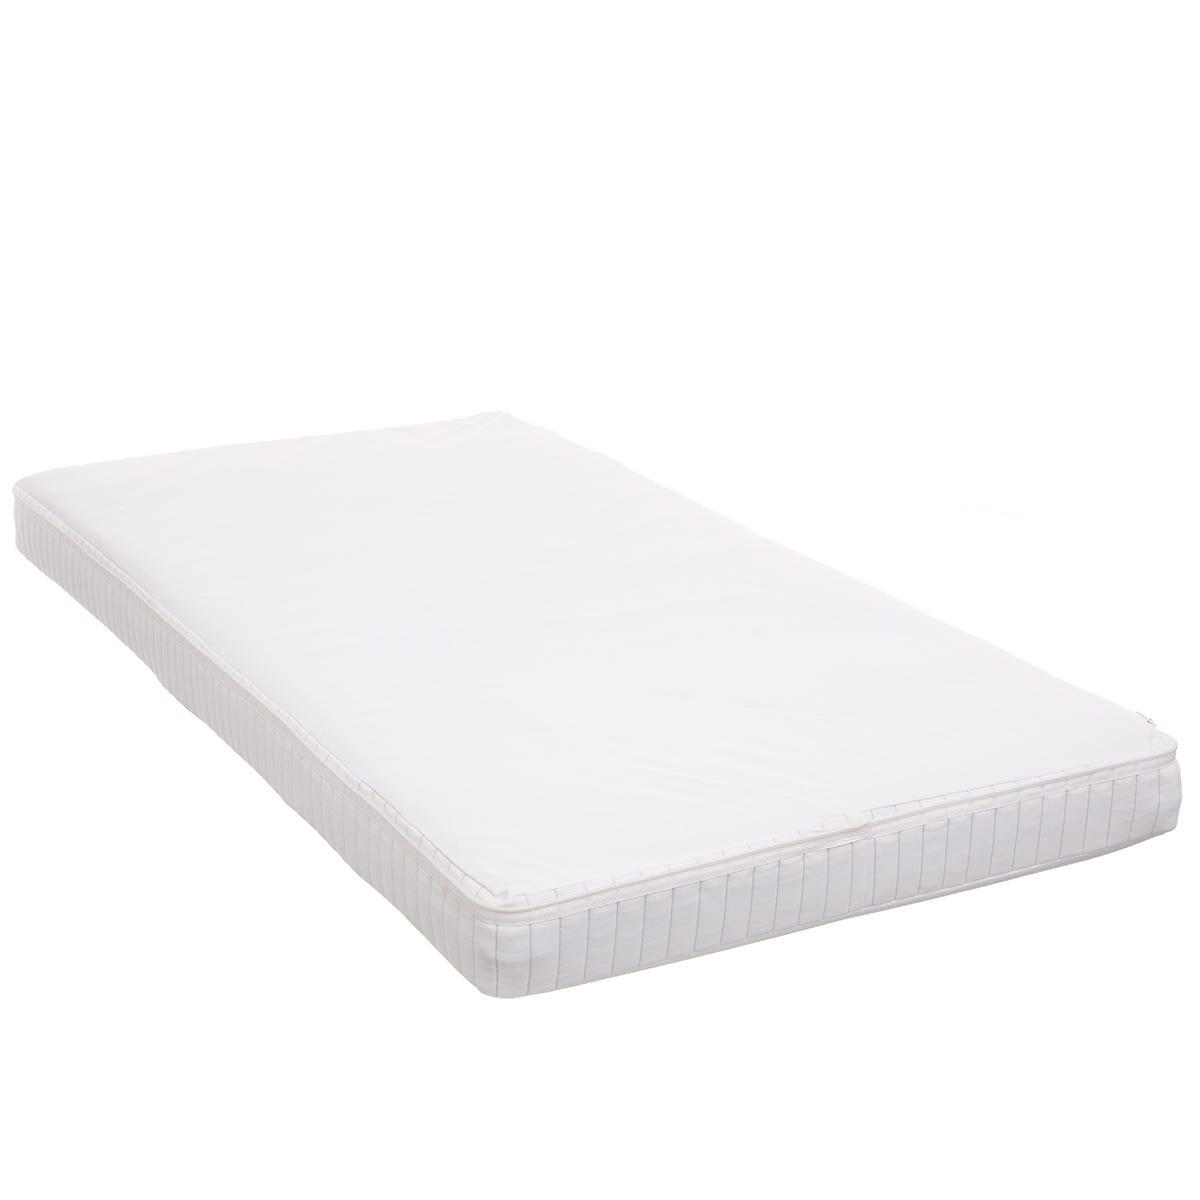 Obaby Moisture Management 140 X 70 Dual Core Cot Bed Mattress